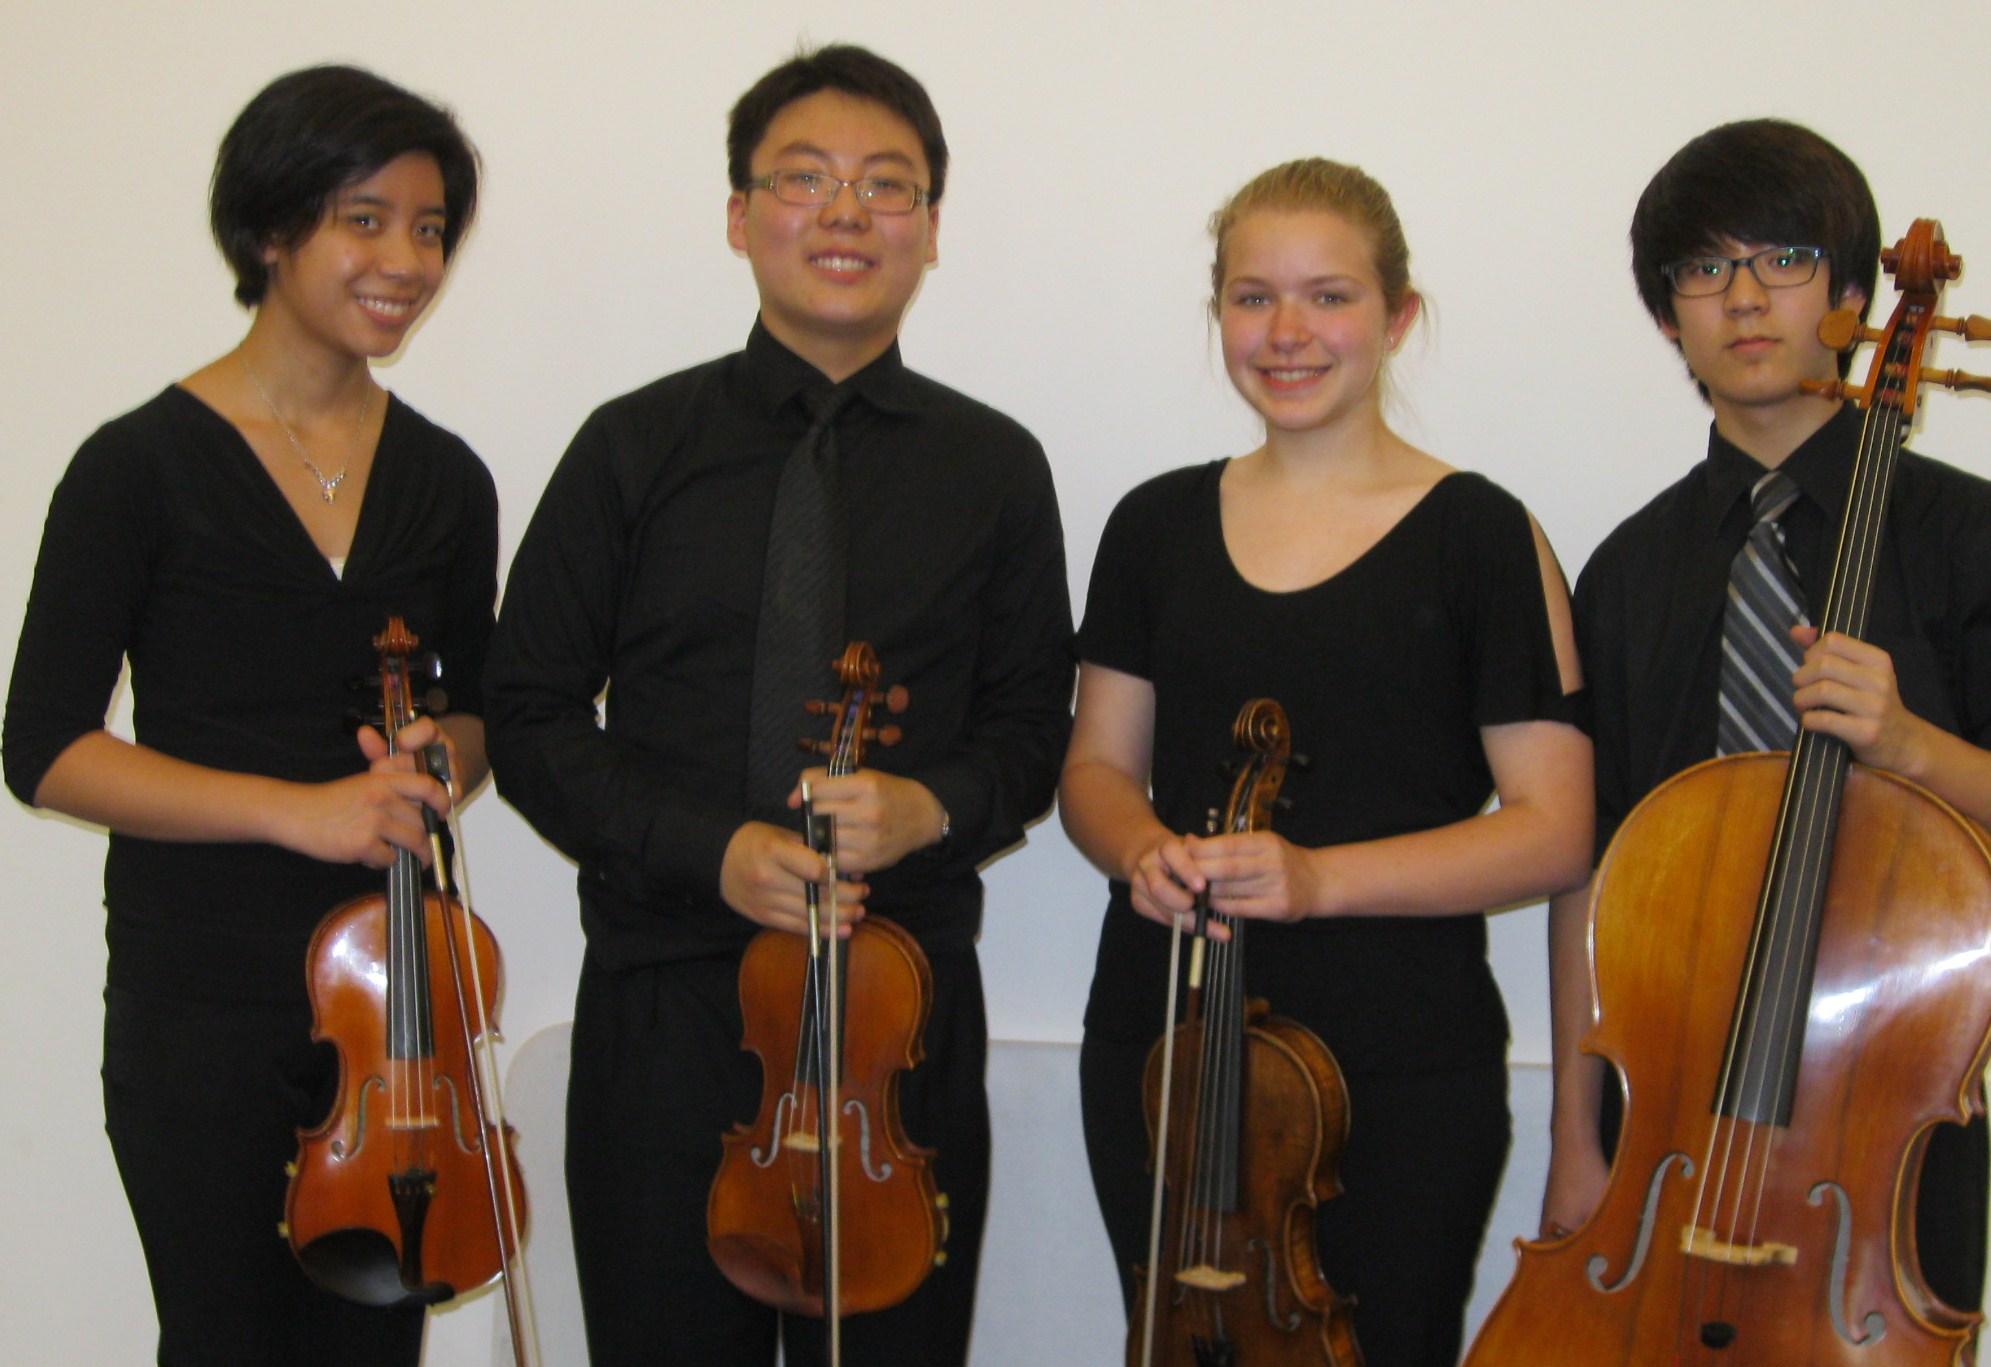 Our premier string quartet! Constance Kaita, violin I - Kangsoo Samuel Lee, violin II -Daelyn Kauffman, viola - Kangmin Joseph Lee, cello